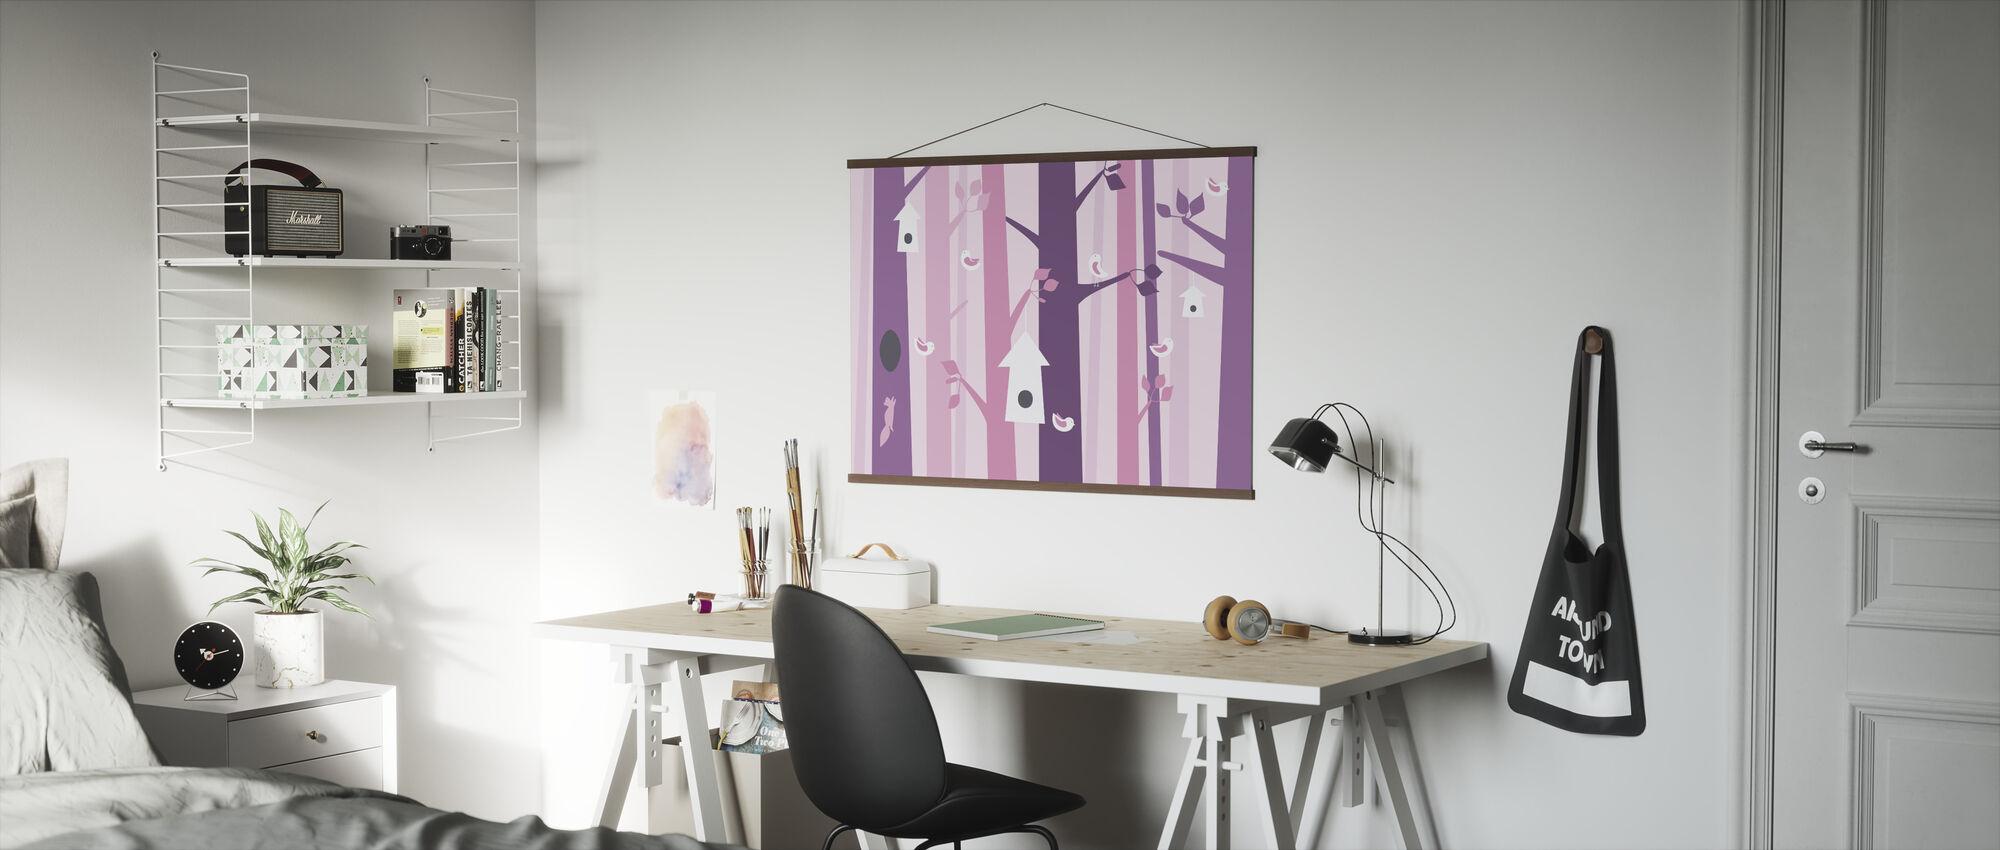 Birdforest - Pink - Poster - Office